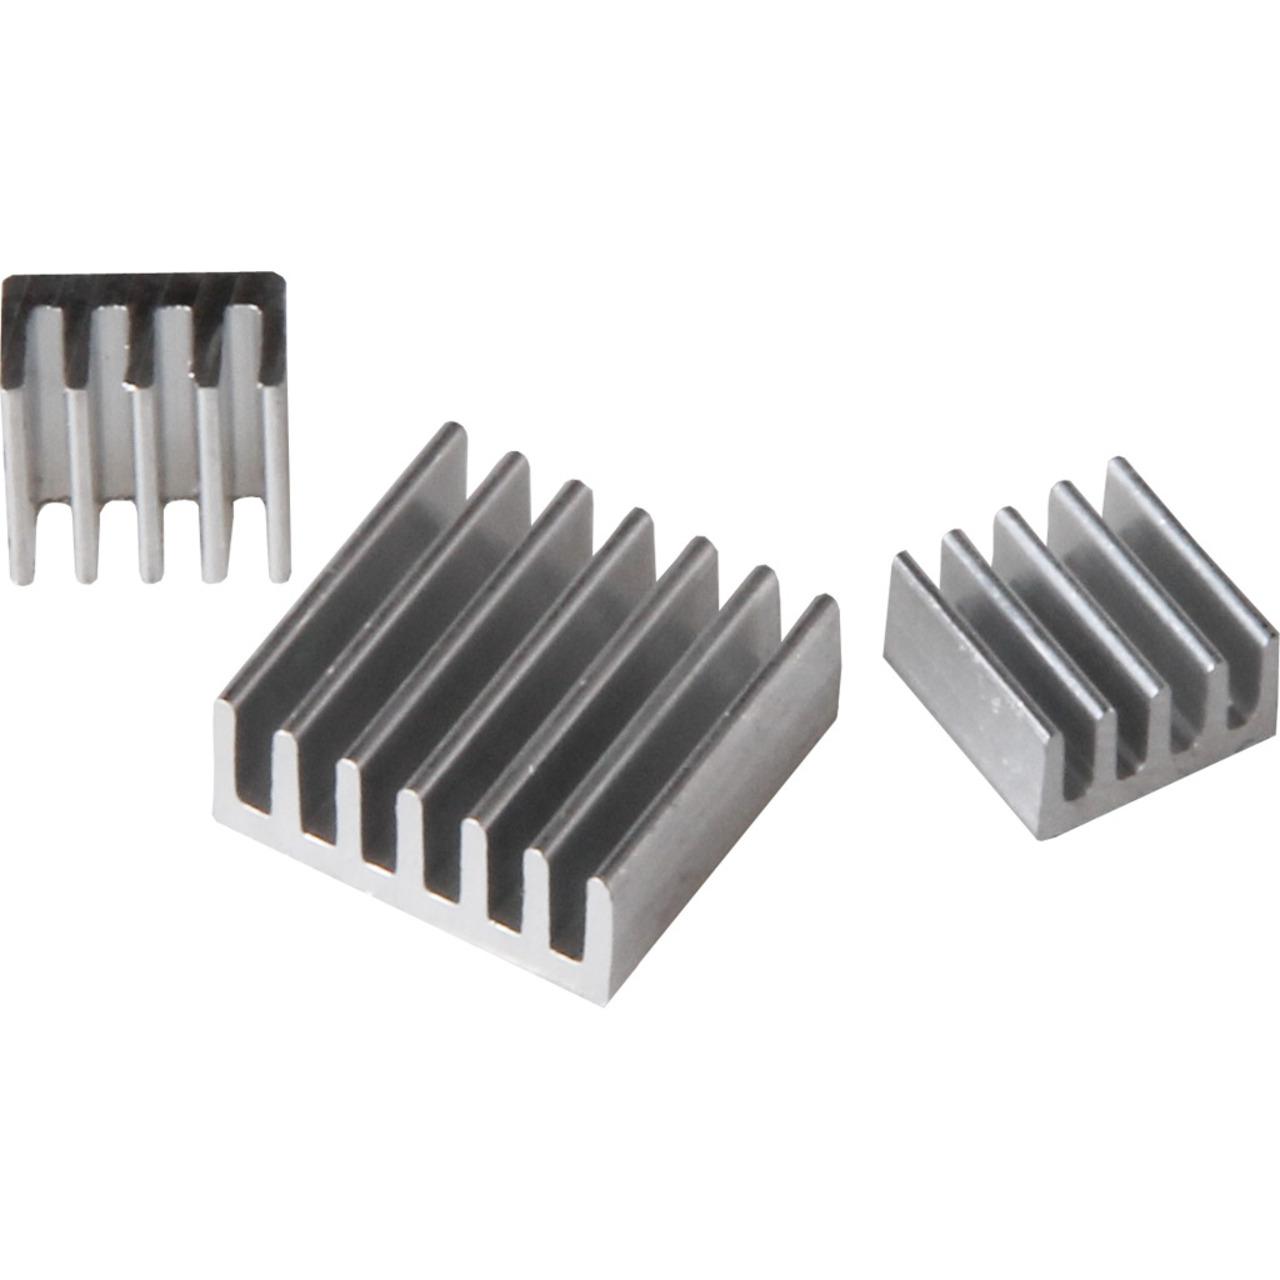 Image of Amerry Kühlkörper-Set für Minicomputer